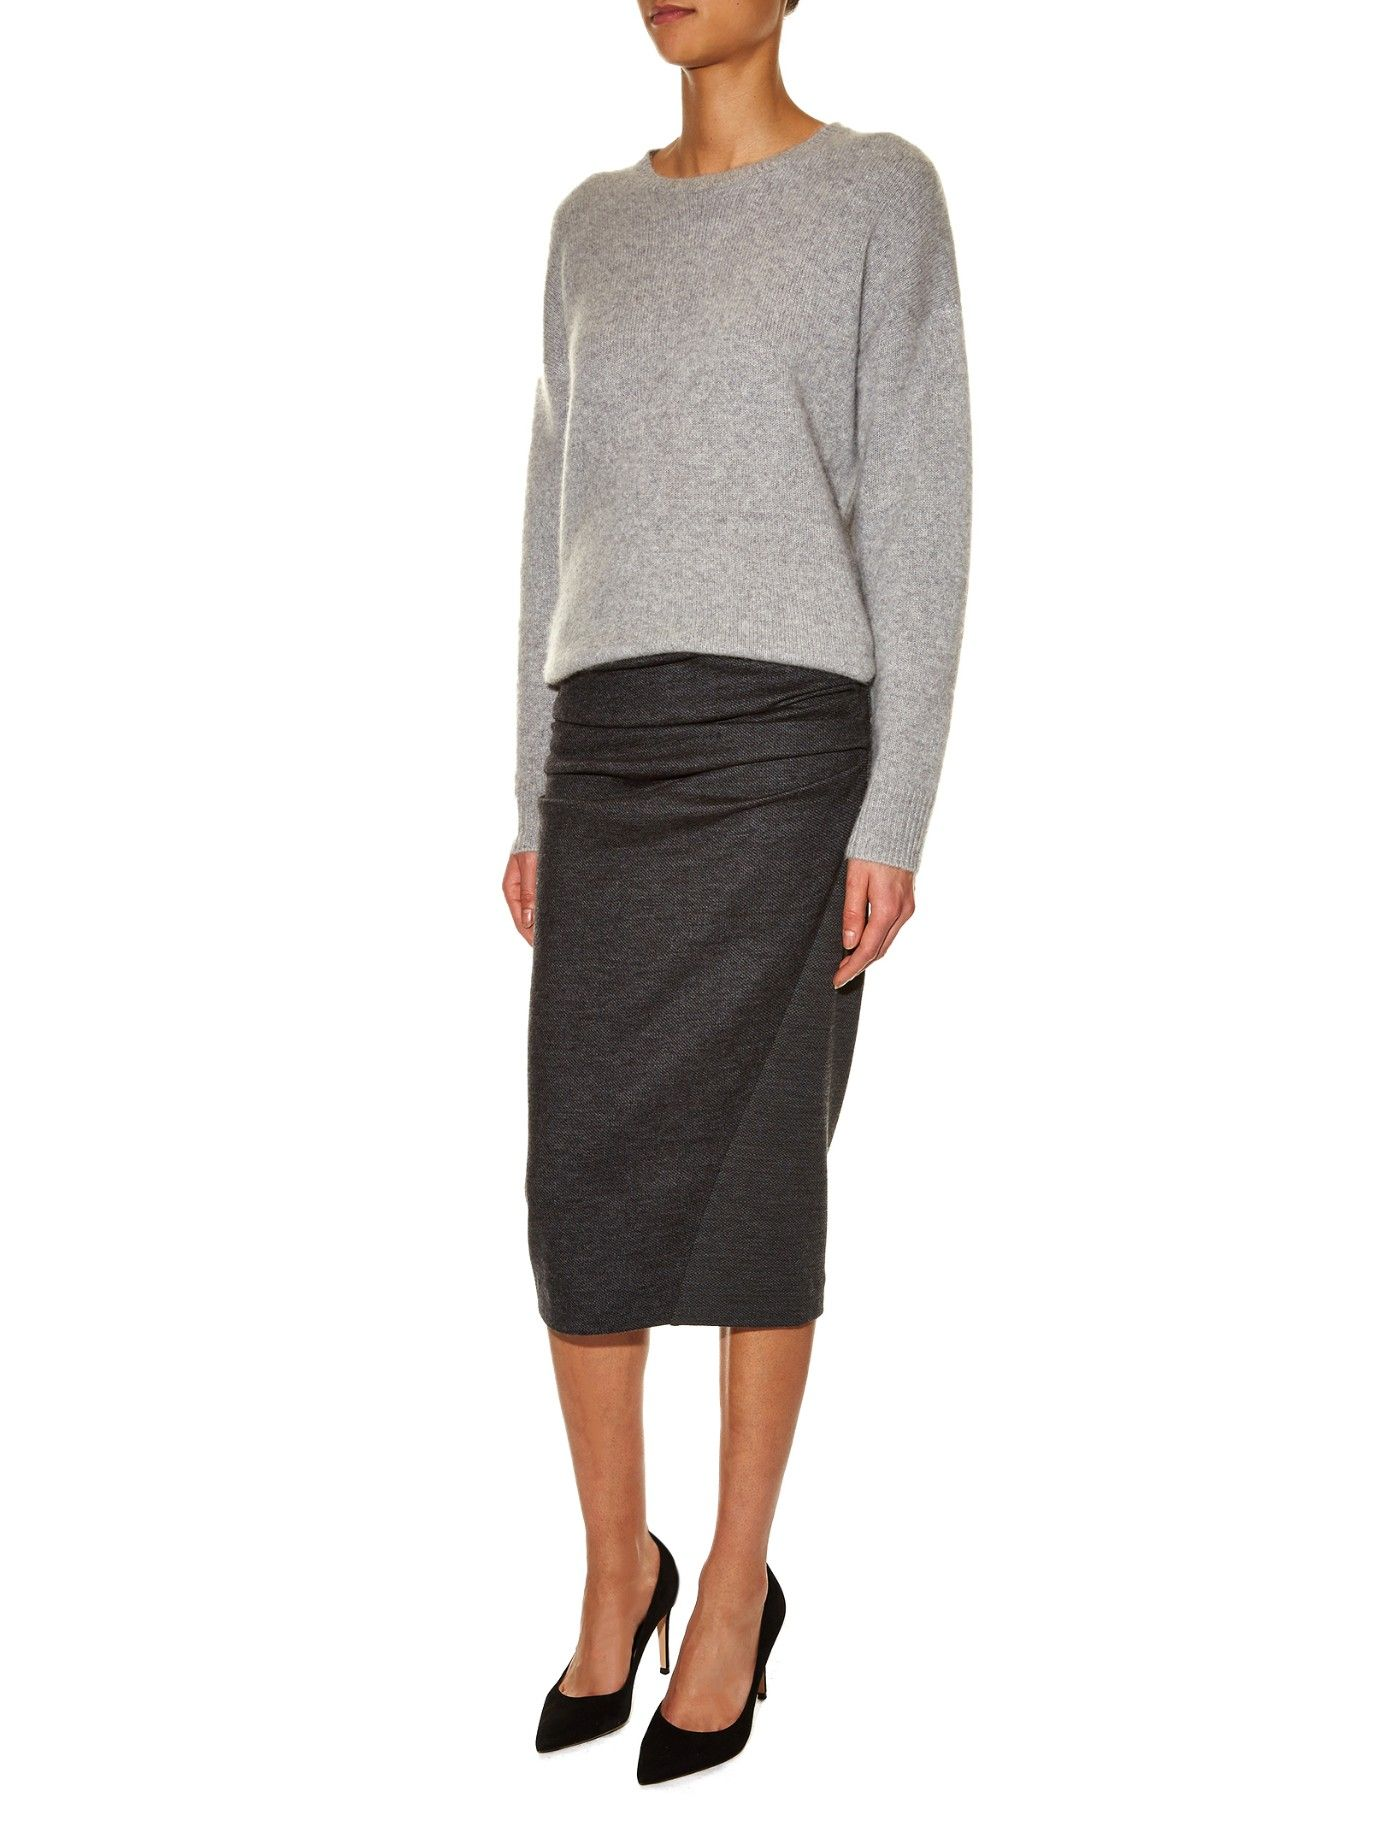 Moritz skirt | Max Mara | MATCHESFASHION.COM UK